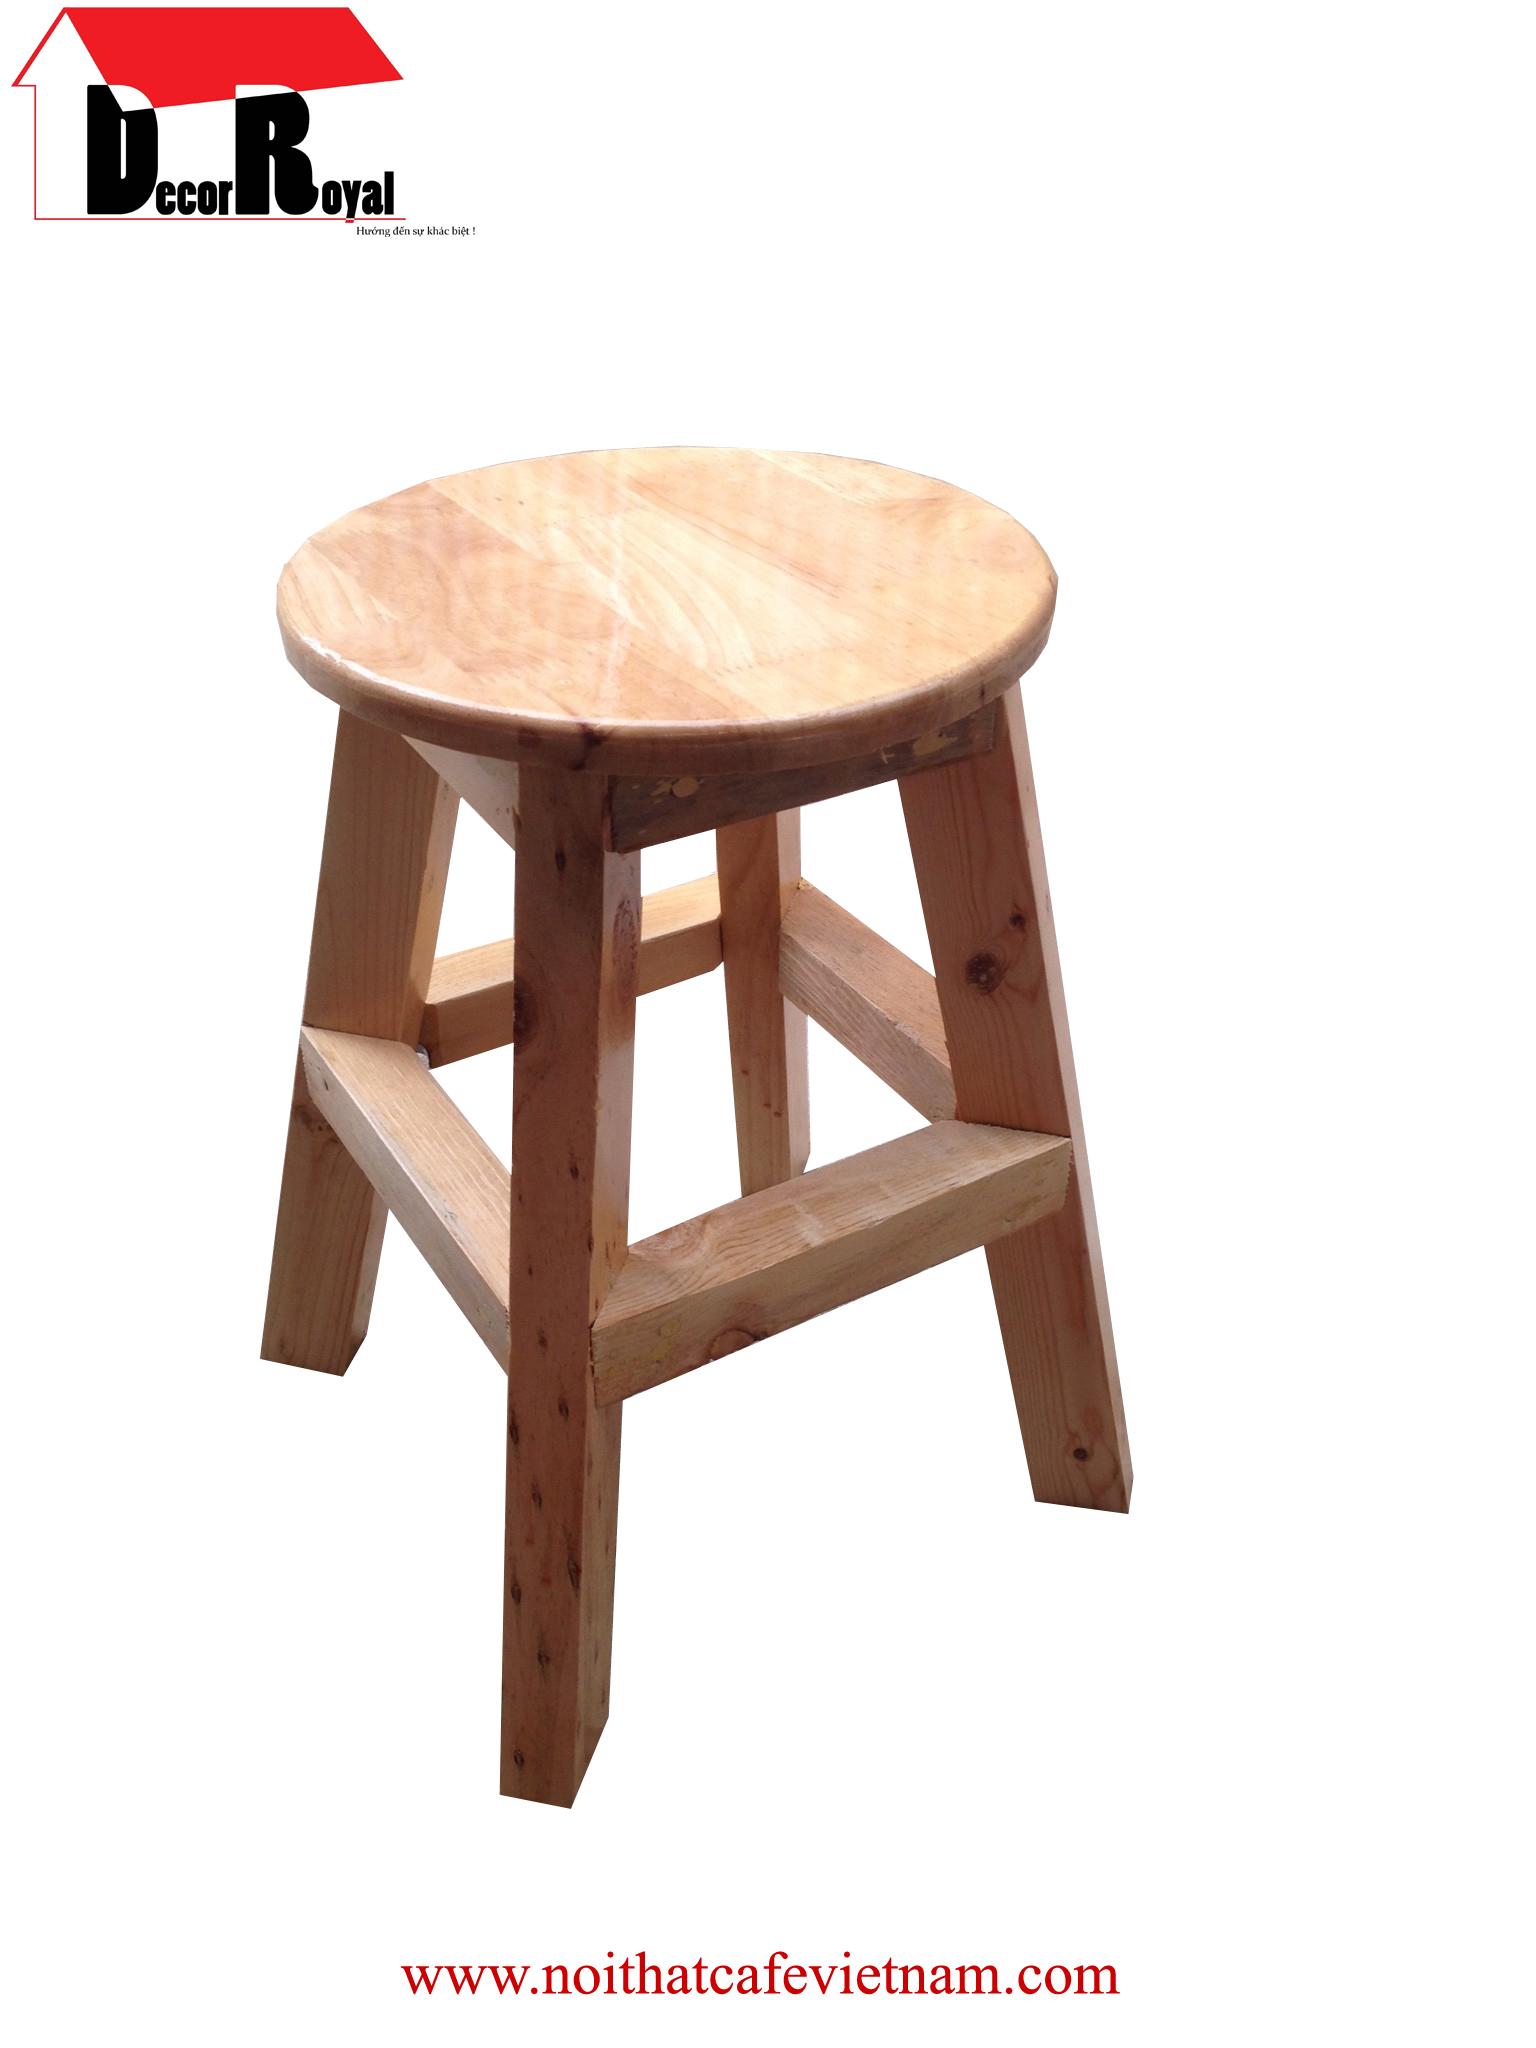 Ghế gỗ tròn